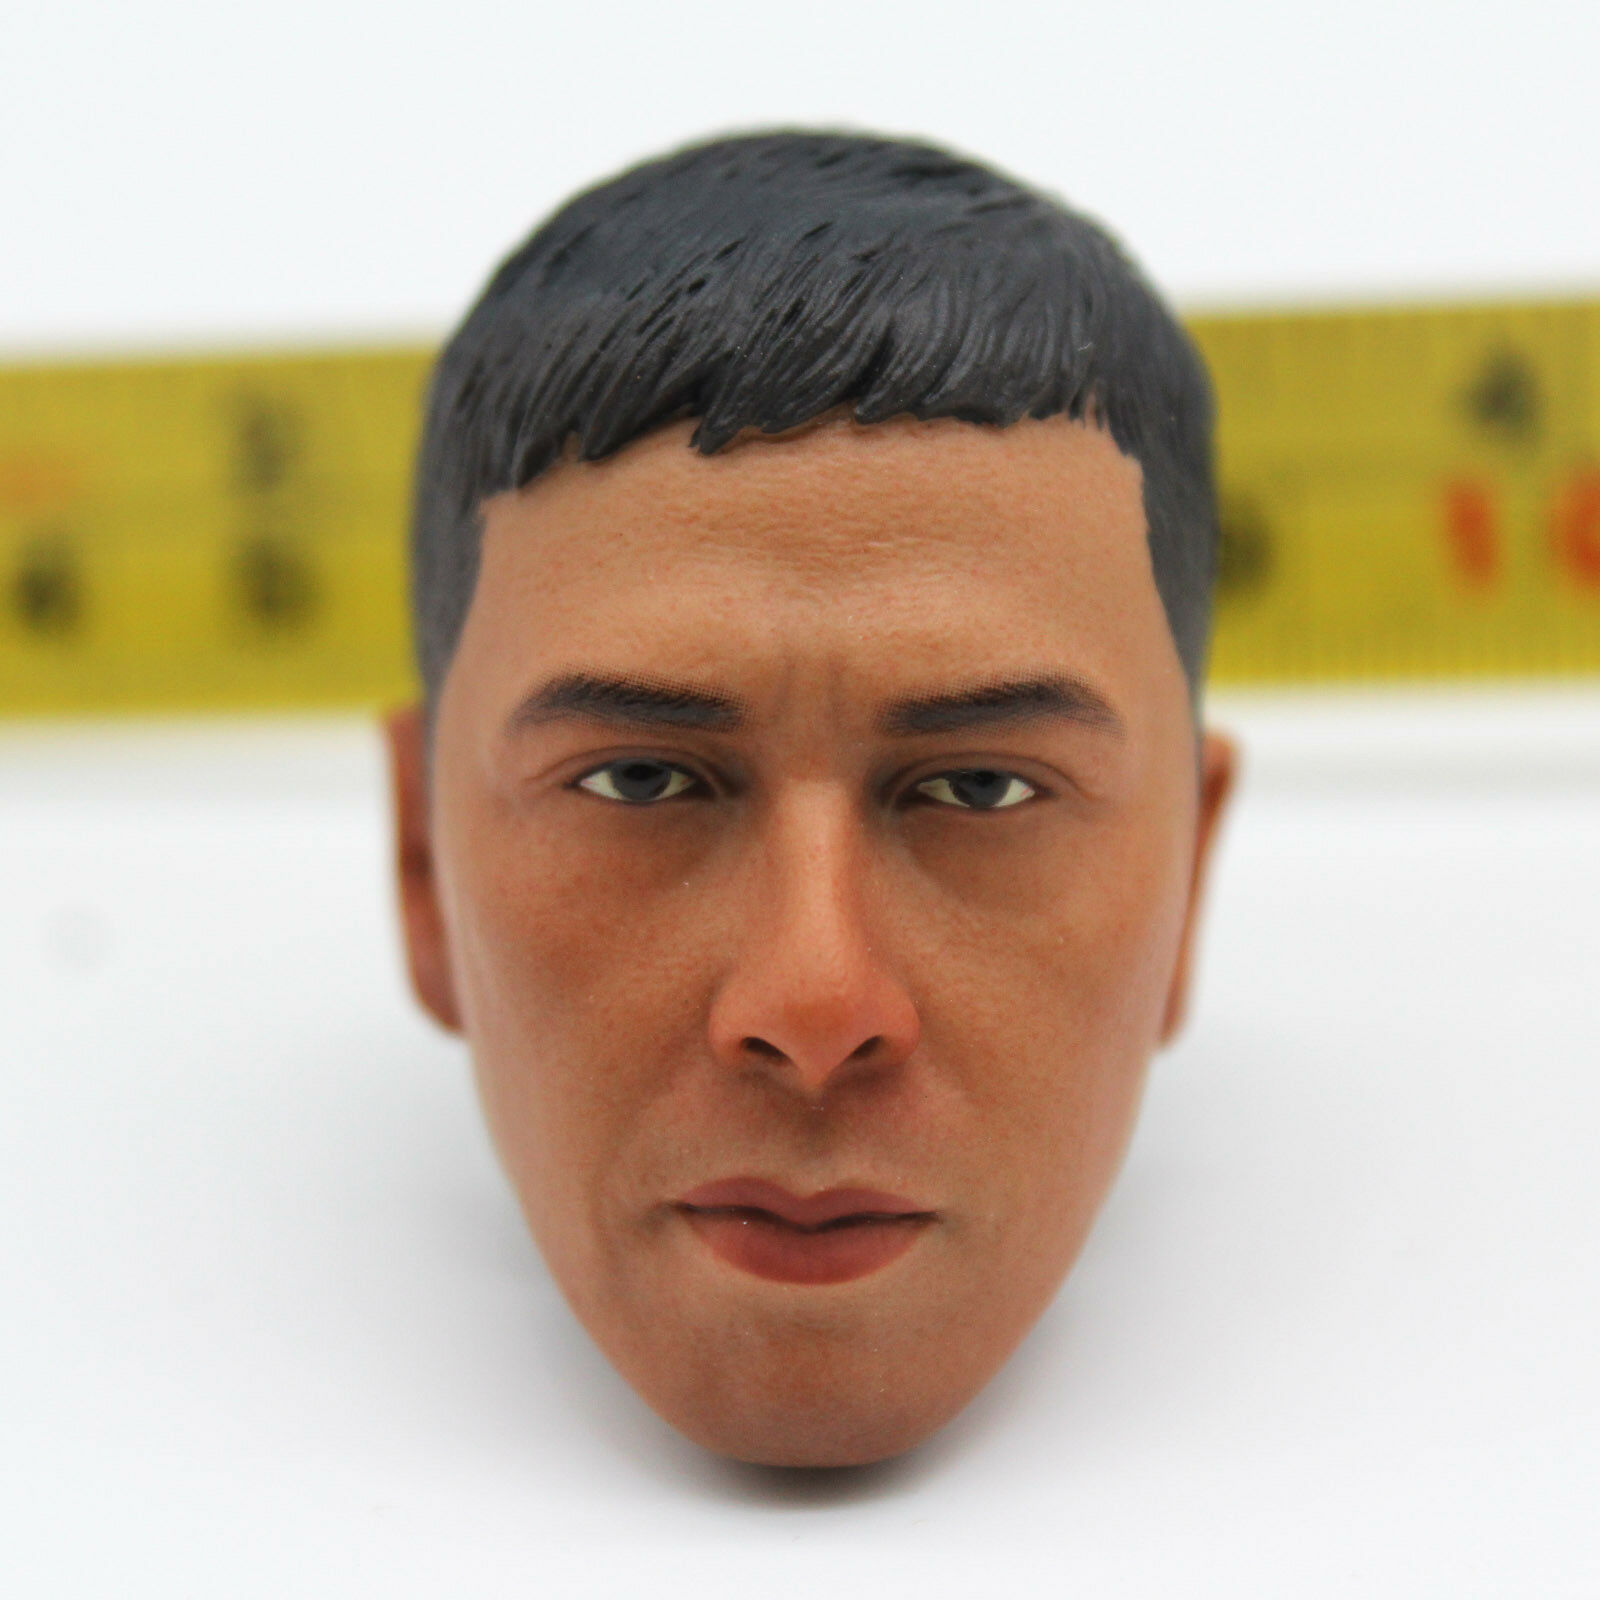 TD32-21 1 6th Scale Action Figure - - - Male Head Sculpt F 67026b